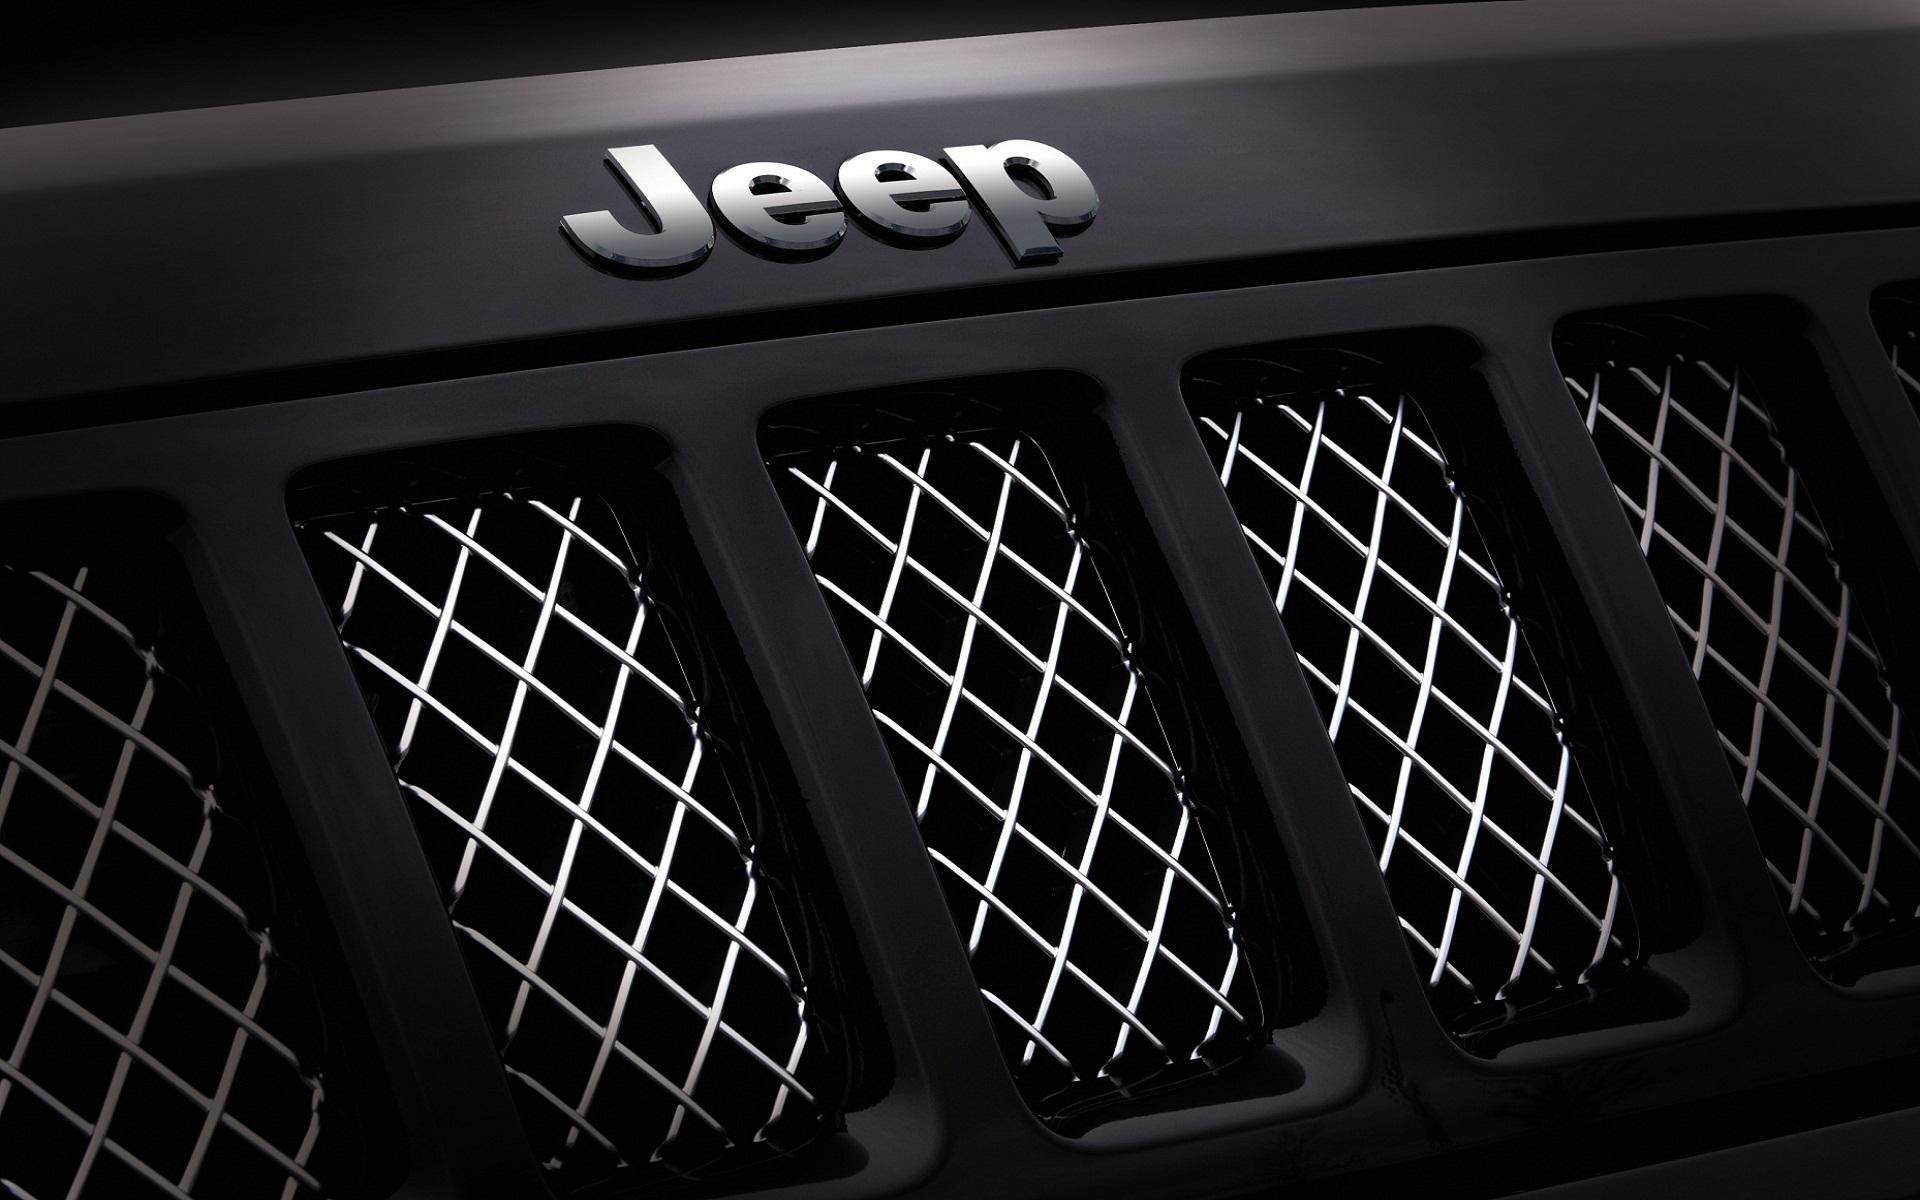 The Avegners Wallpaper Quotes Jeep Logo Wallpapers Pixelstalk Net